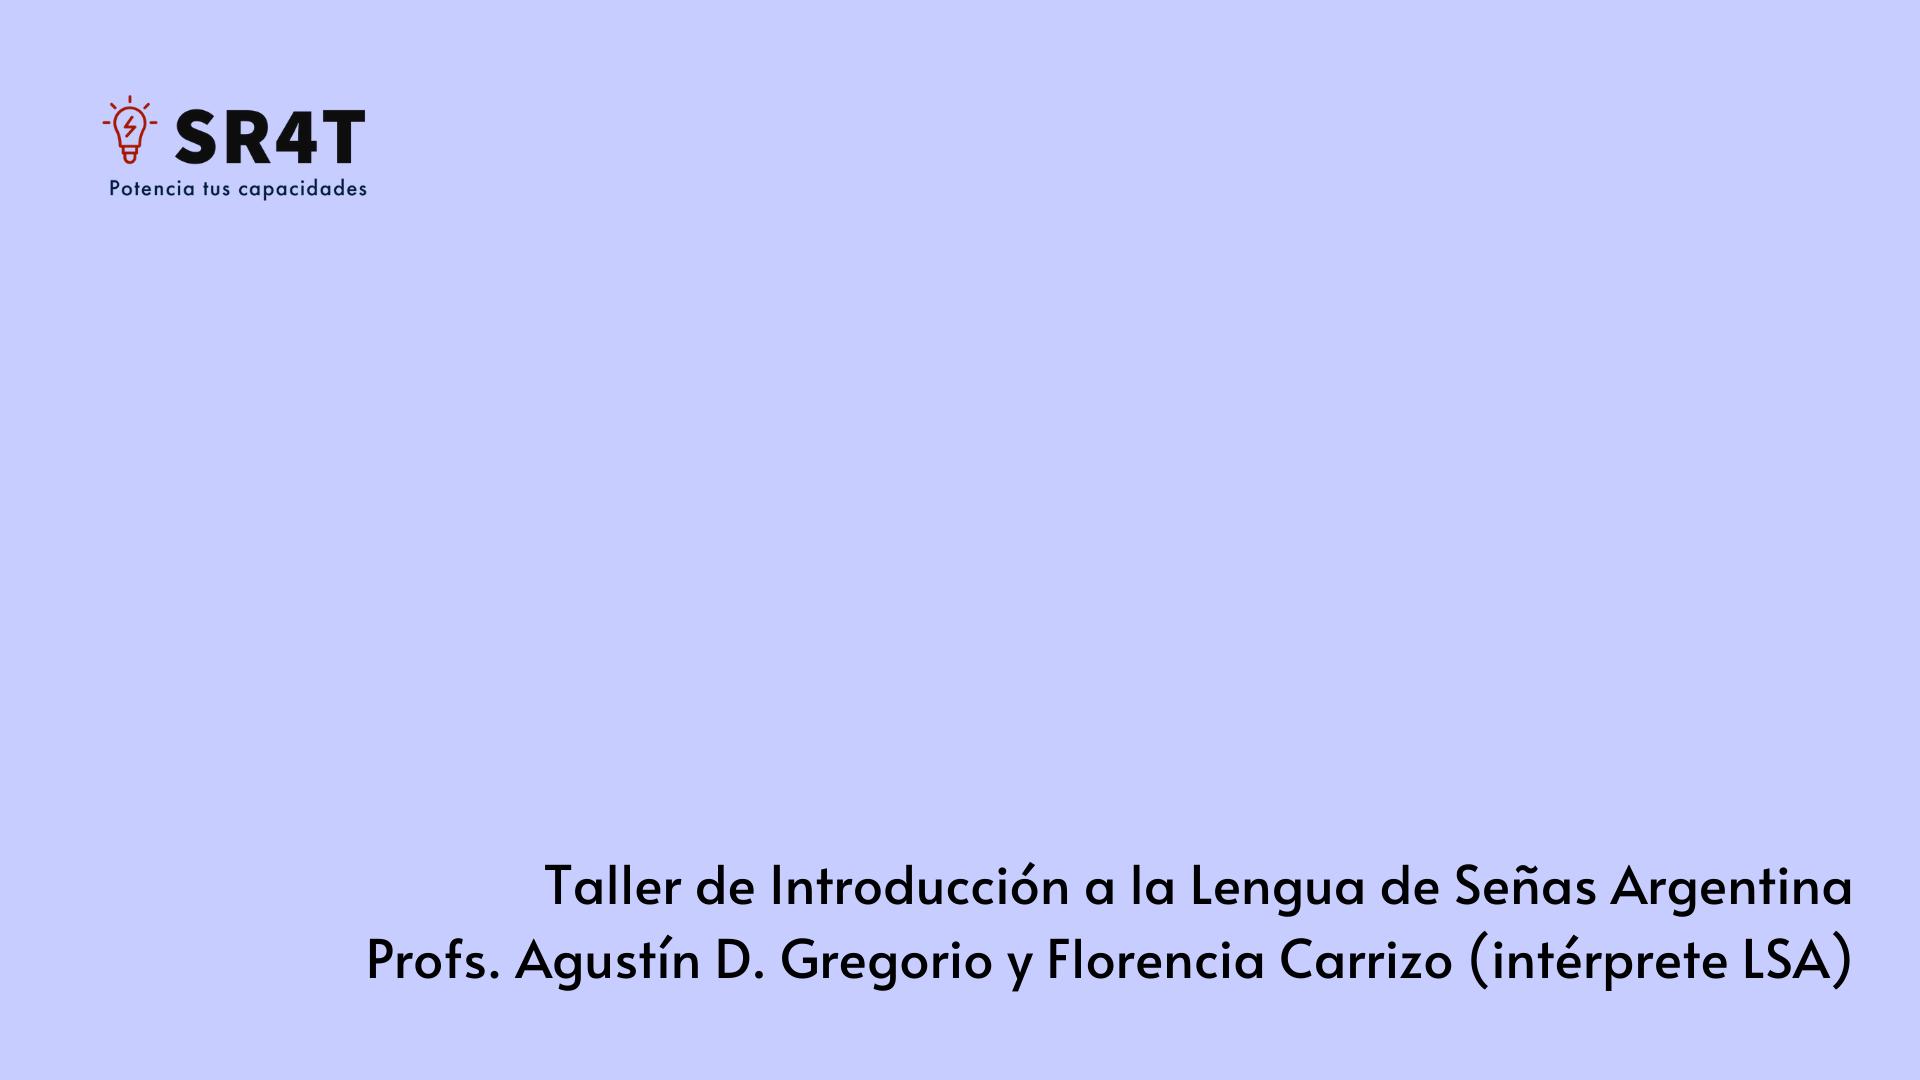 Cartel promocional sobre el curso de Lengua de Señas Argentina